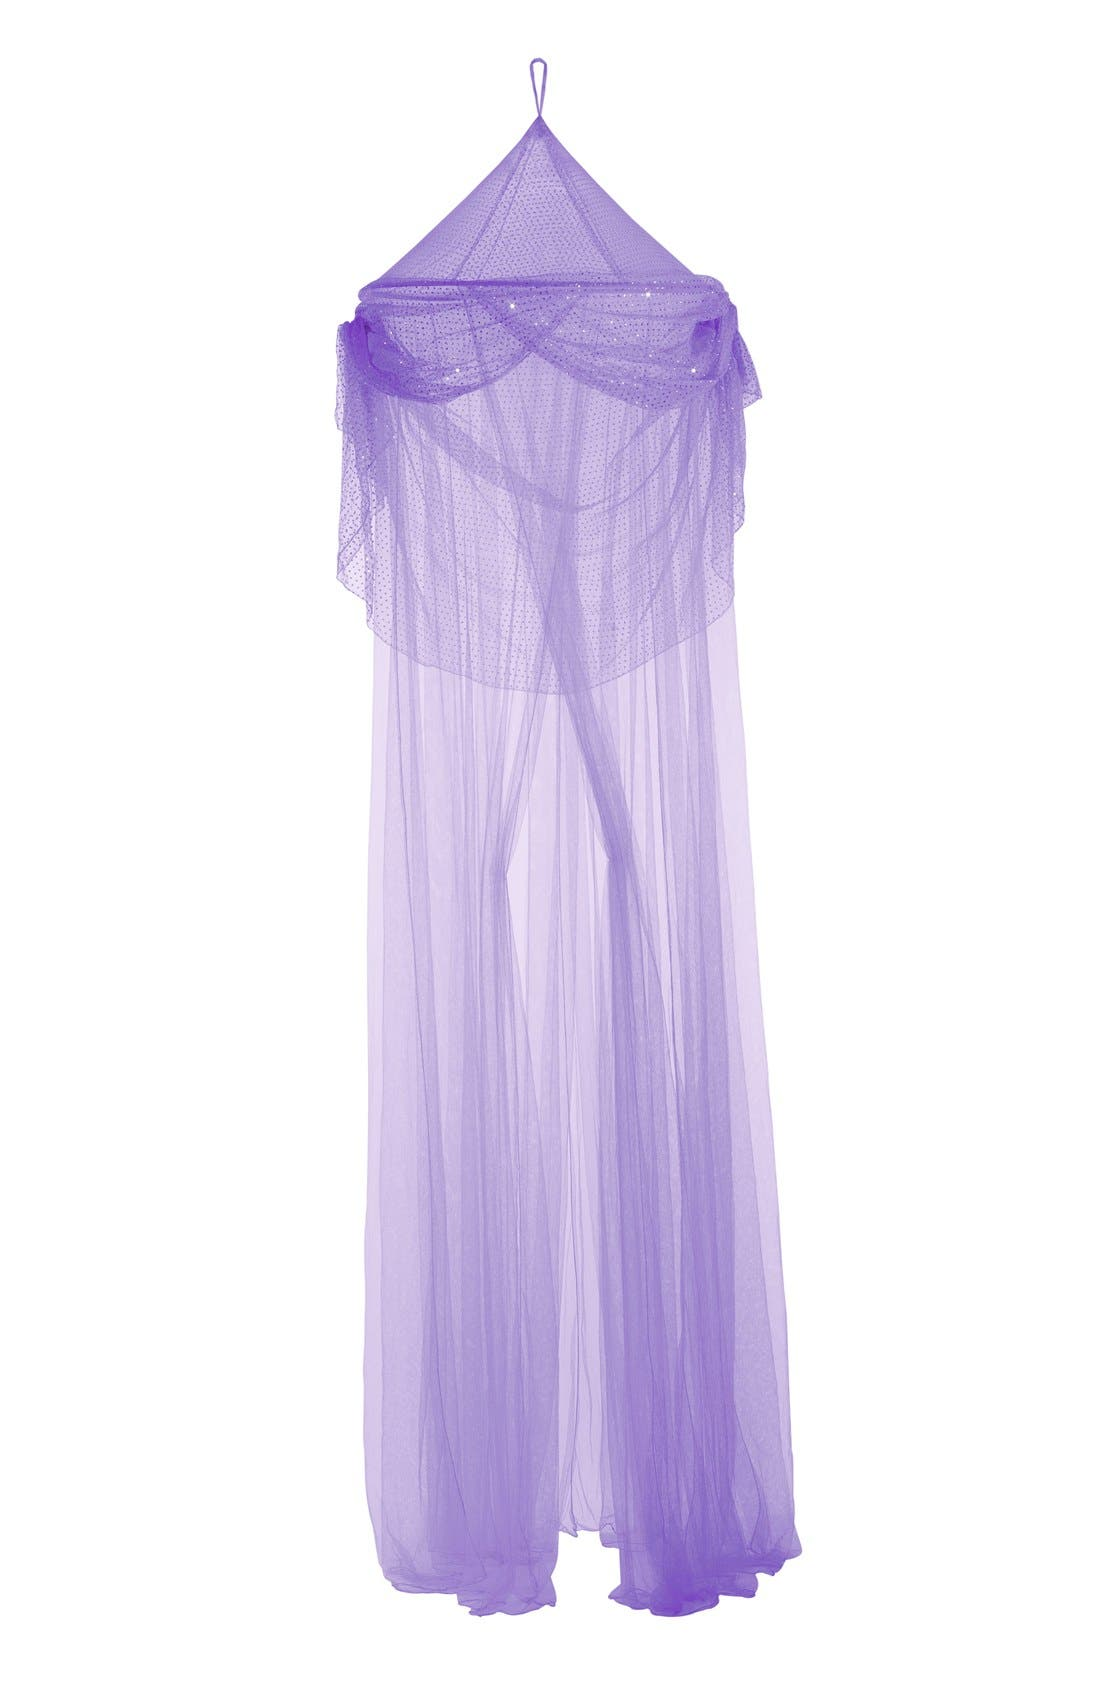 Main Image - 3C4G 'Purple SparkleTastic' Bed Canopy